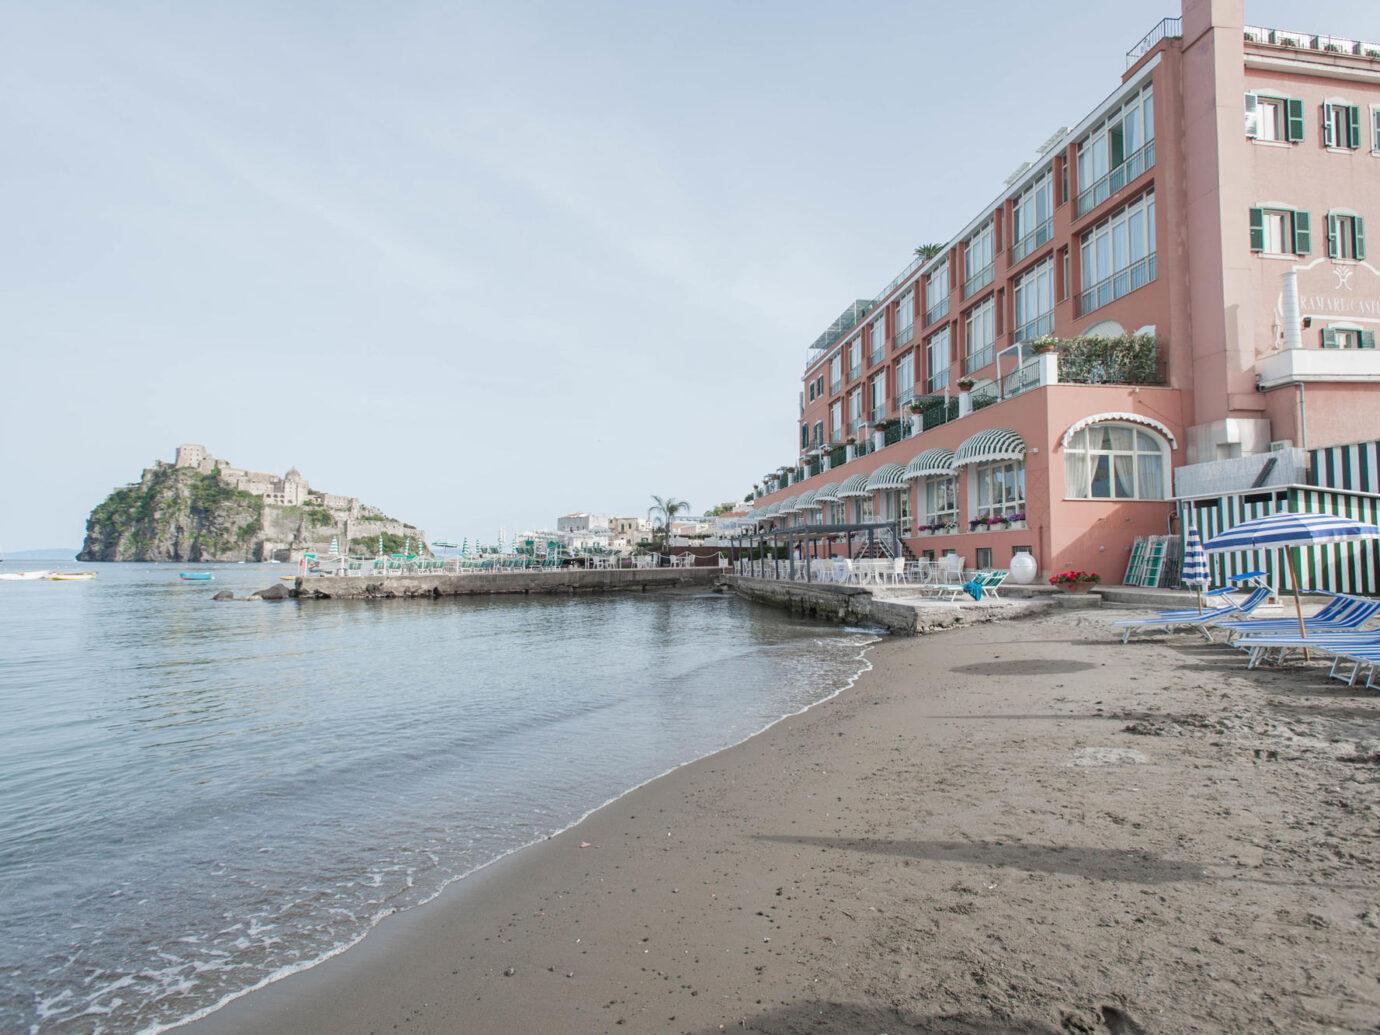 Grounds at the Miramare e Castello Hotel - Oyster